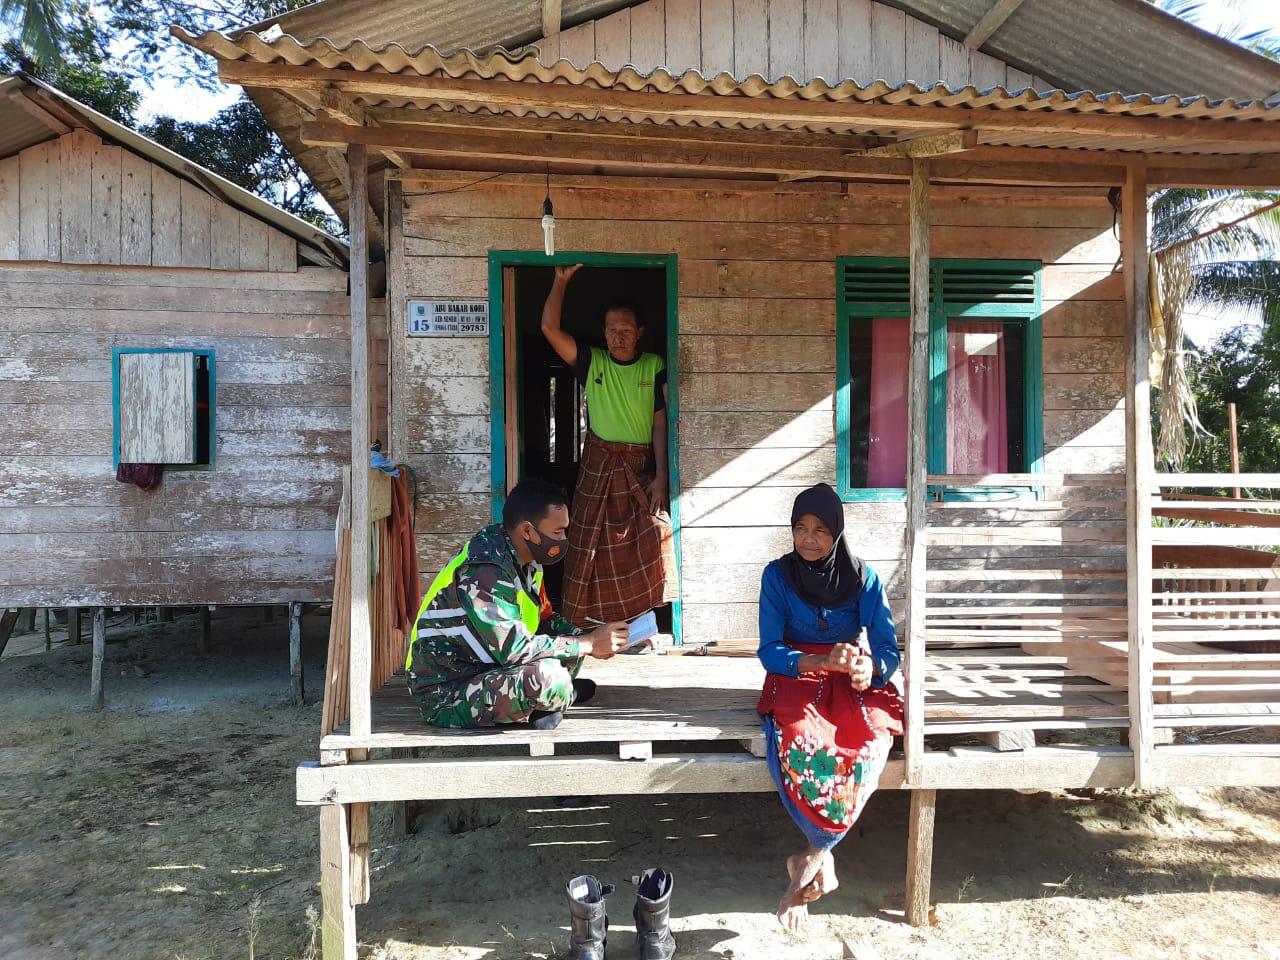 Babinsa Desa Cemaga Utara Lakukan Komsos Dengan Penganyam Tikar Dari Pandan